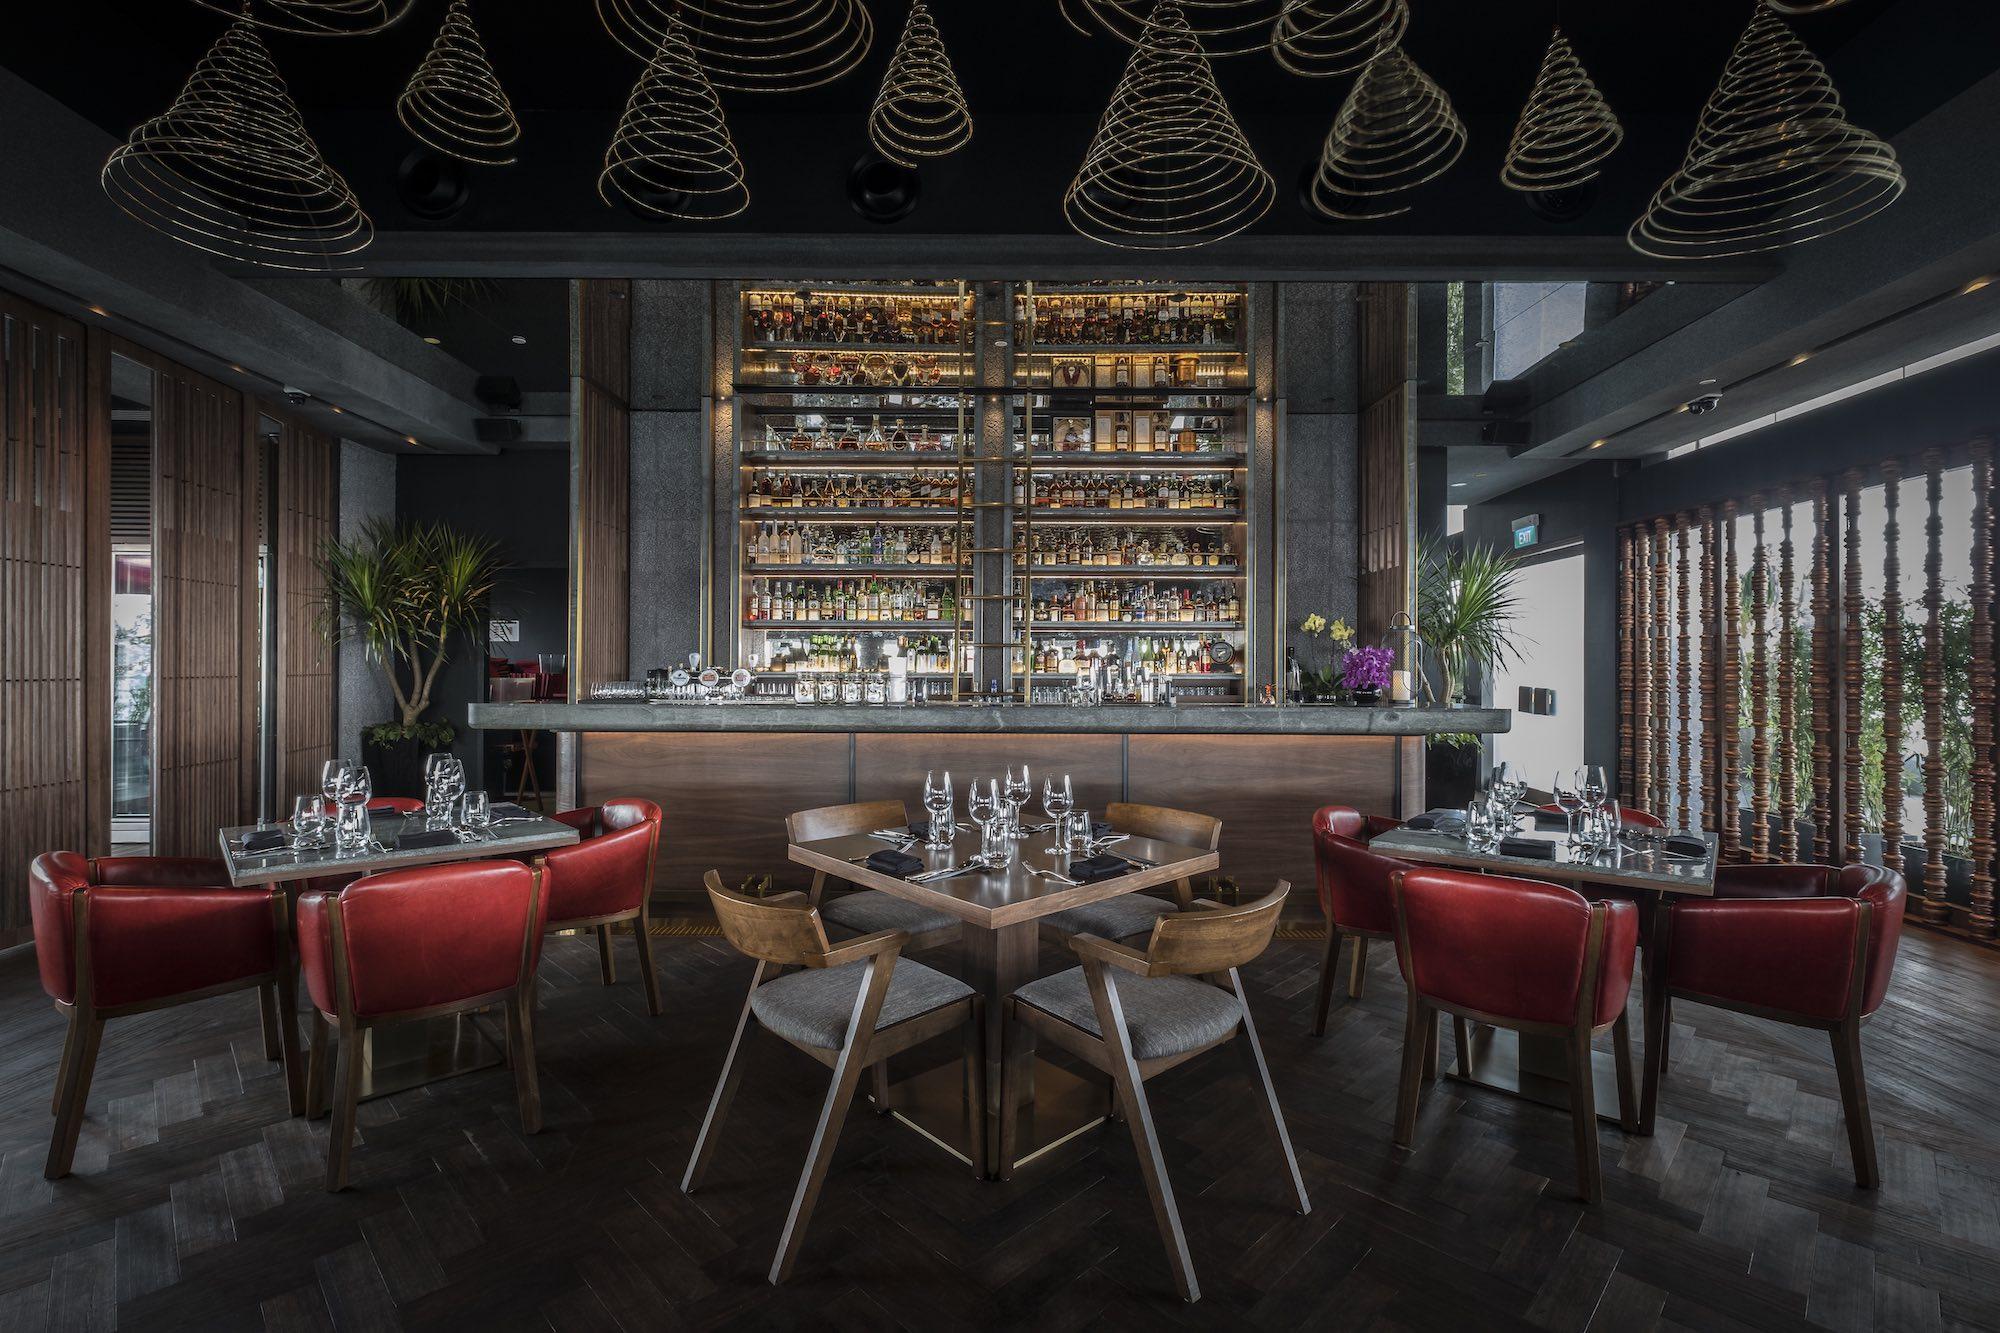 CE LA VI Restaurant Rooftop Bar Interiors Photography Singapore COCO Creative Studio 29